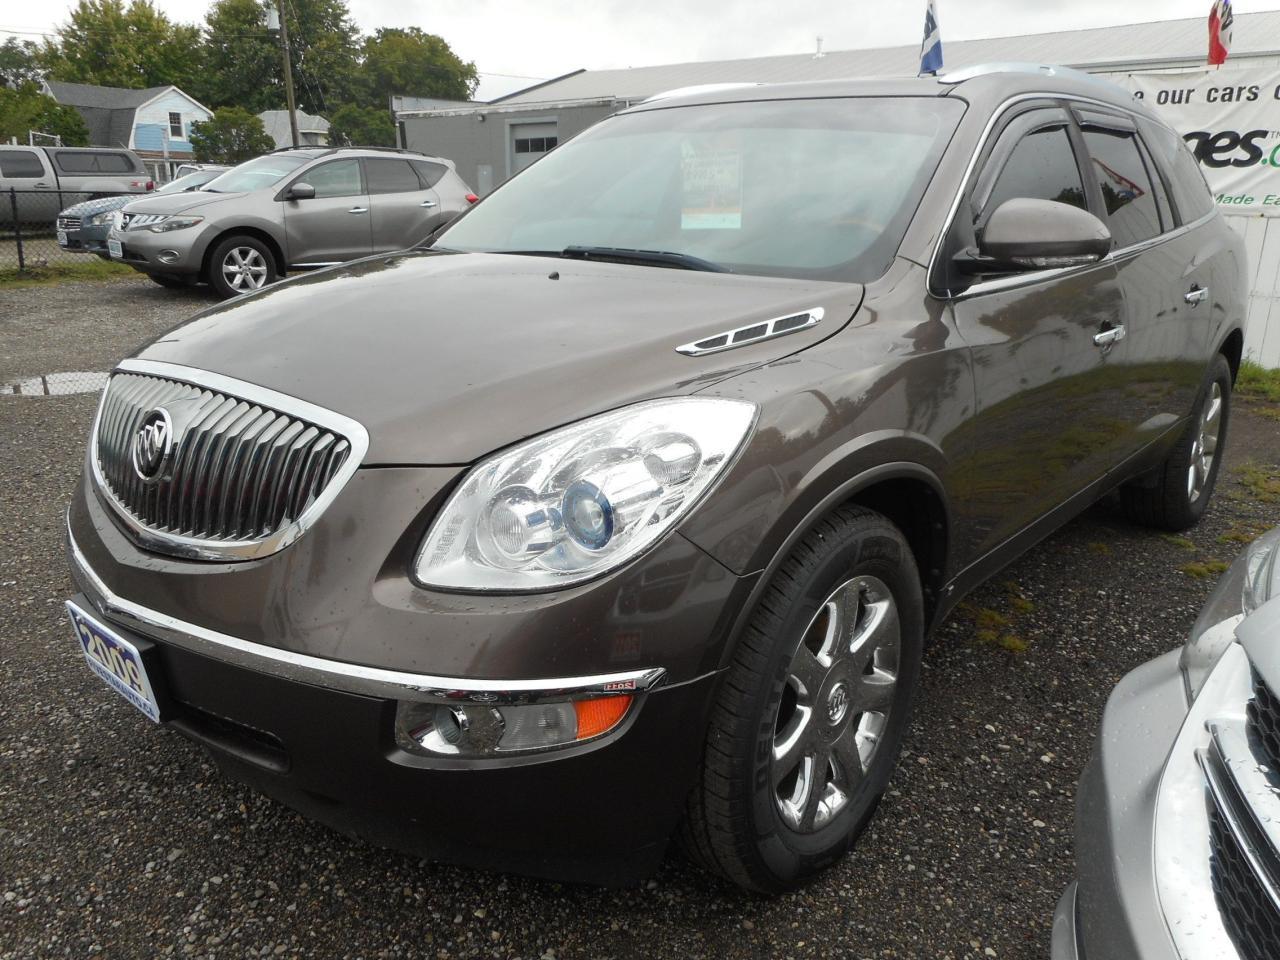 2009 Buick Enclave FULLY LOADED - Certified w/ 6 Month Warranty